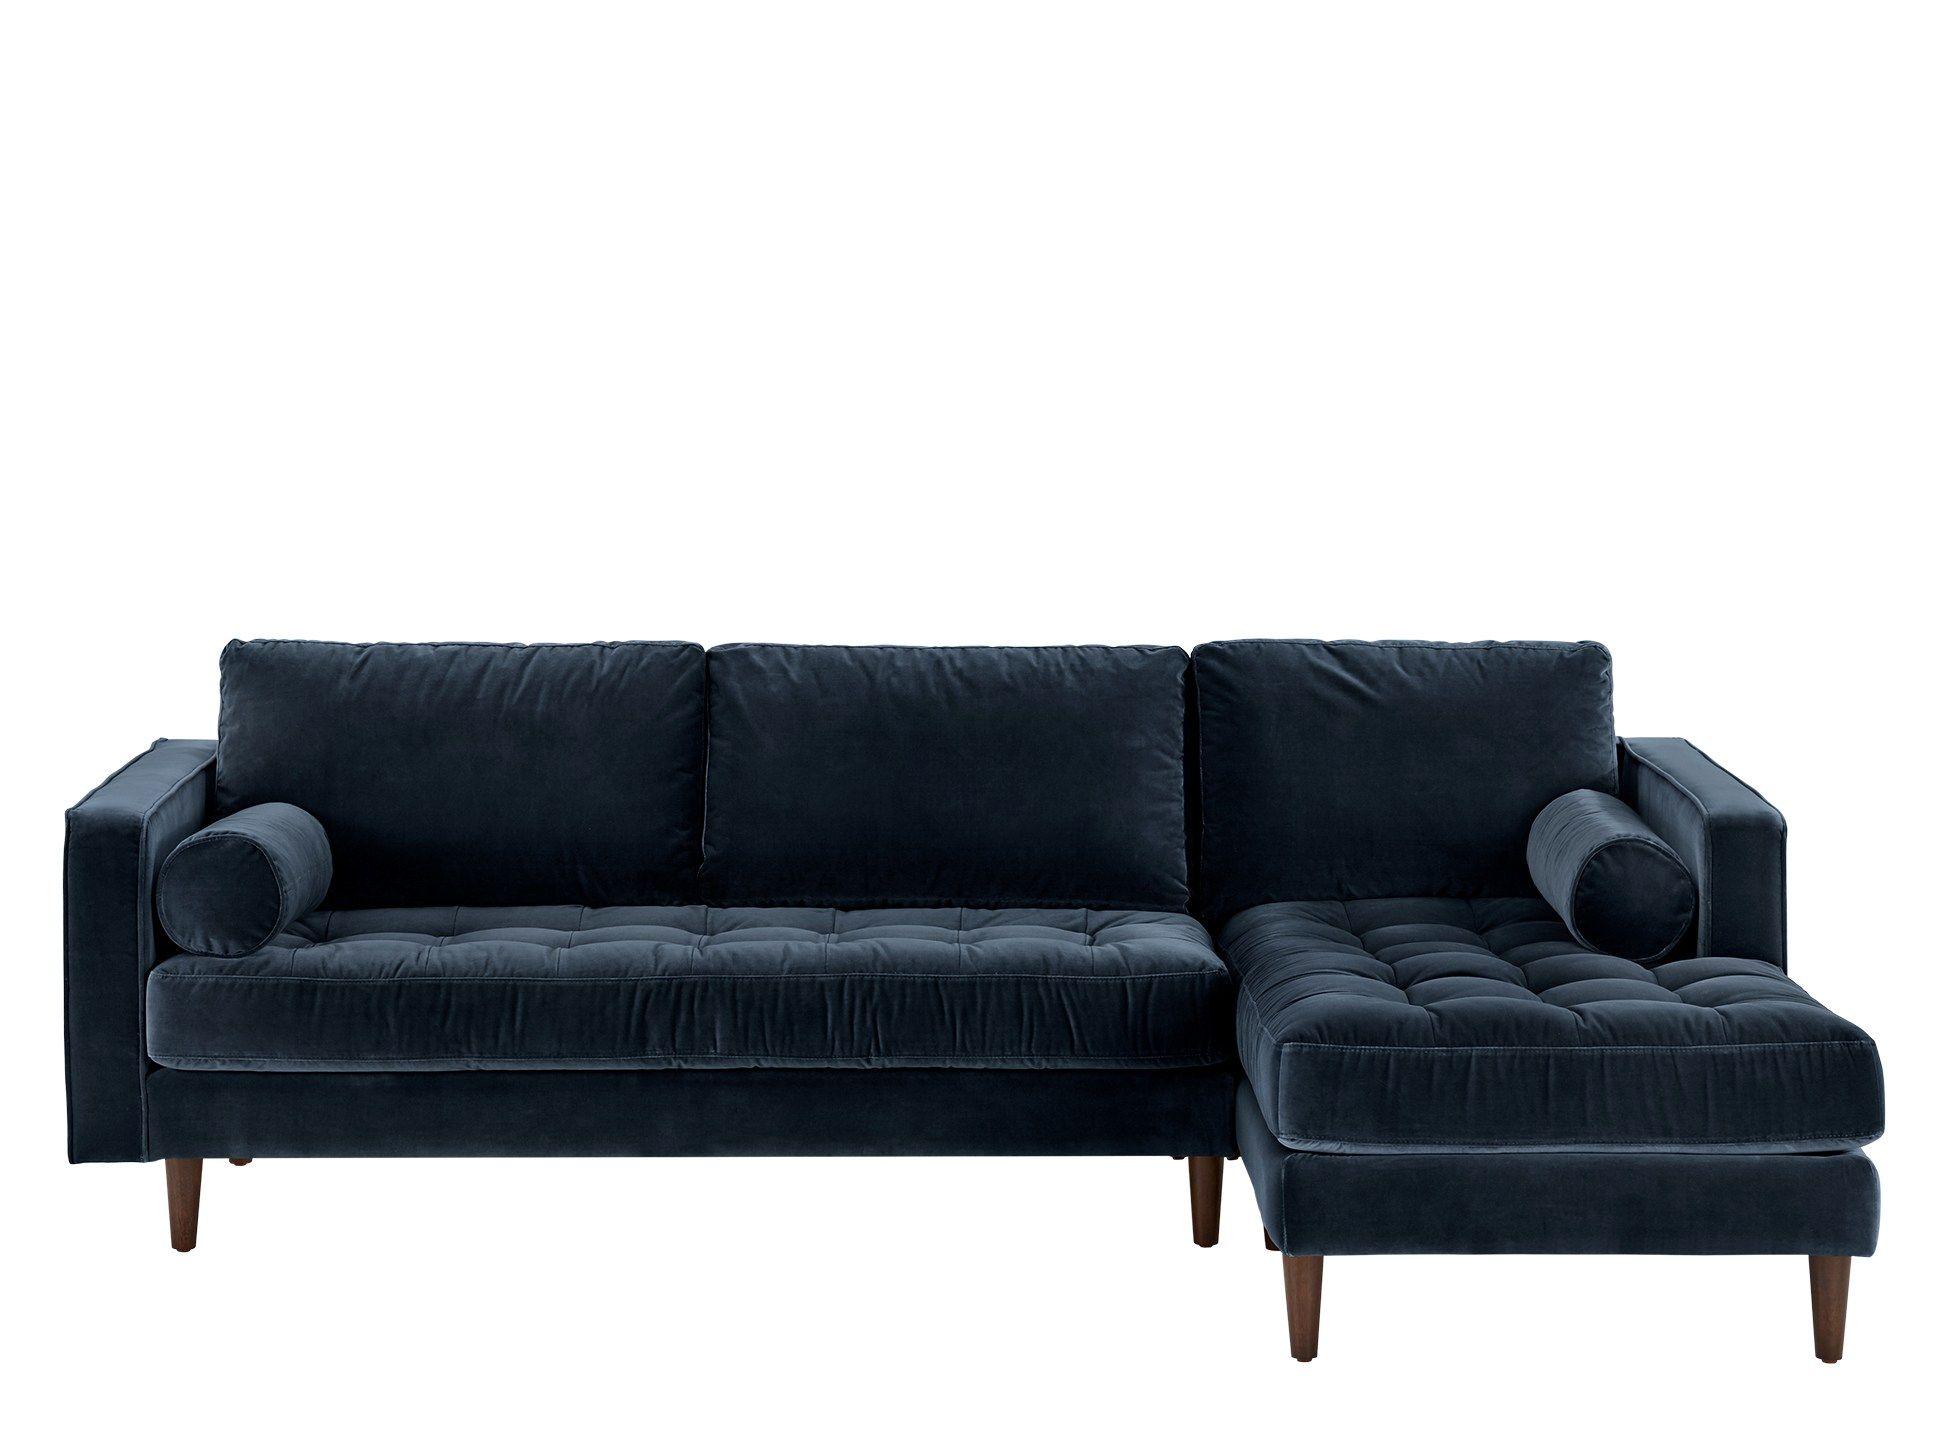 Scott 4 Seater Right Hand Facing Chaise End Corner Sofa Navy Cotton Velvet L Shaped Sofa Corner Sofa Navy Corner Sofa